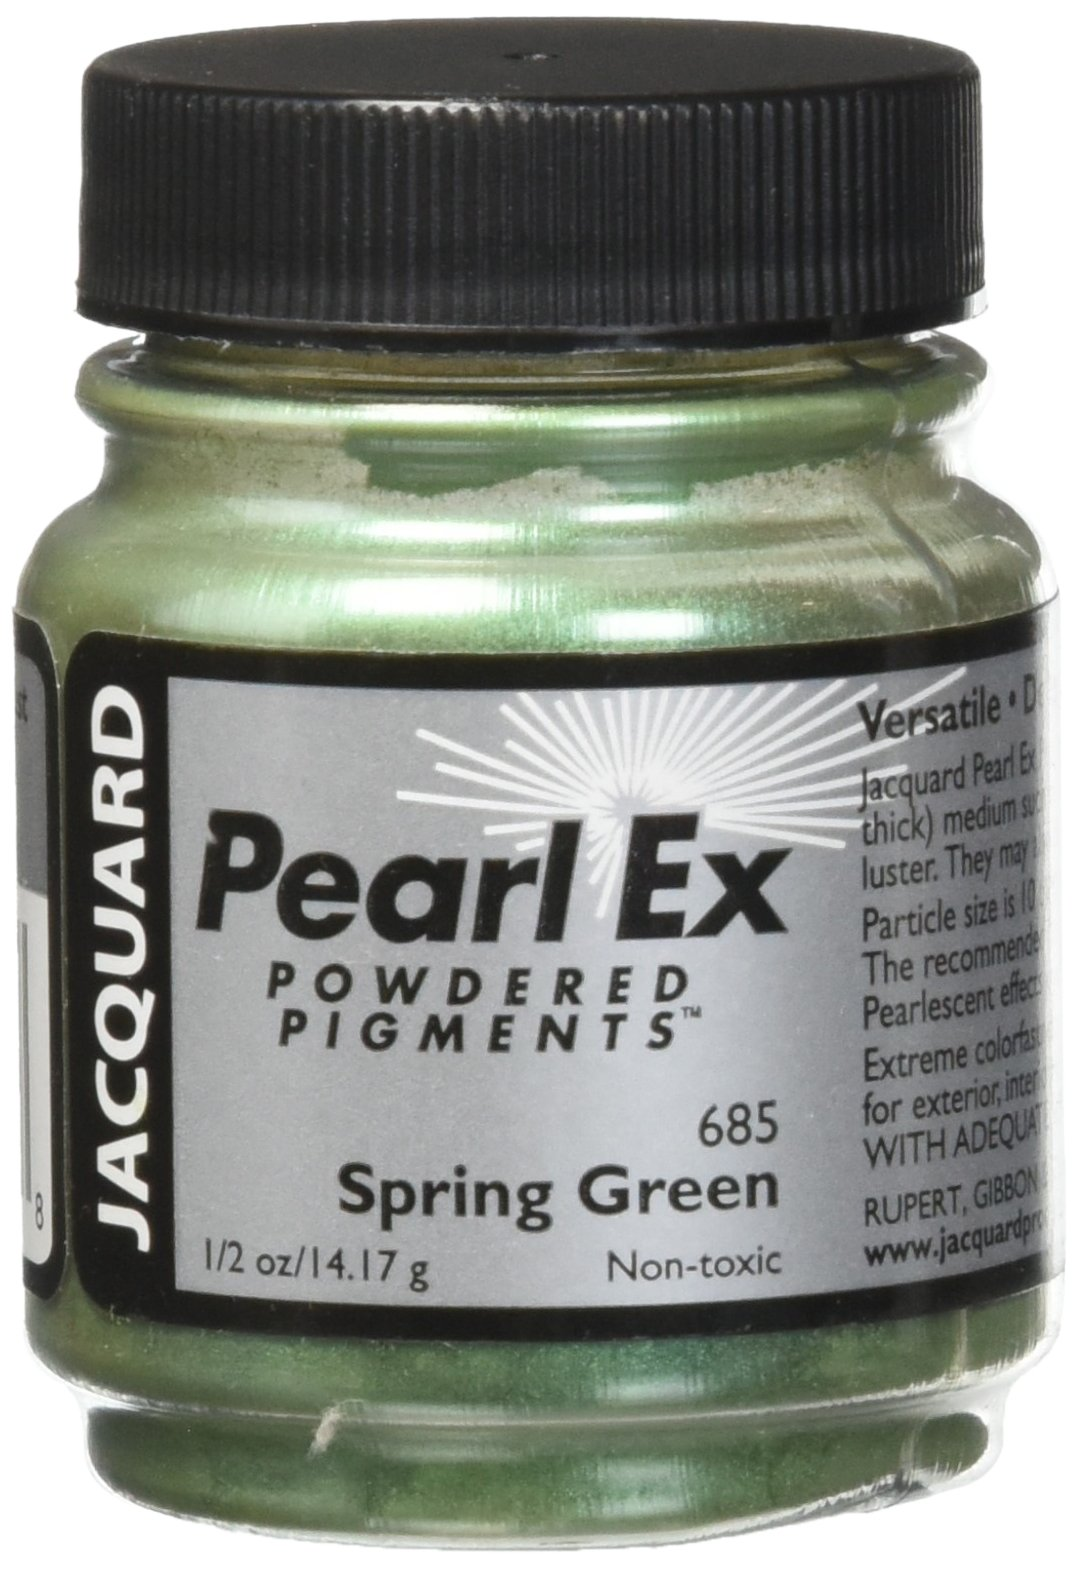 Pigmento Jacquard Pearl Ex 14gr. Verde Primavera